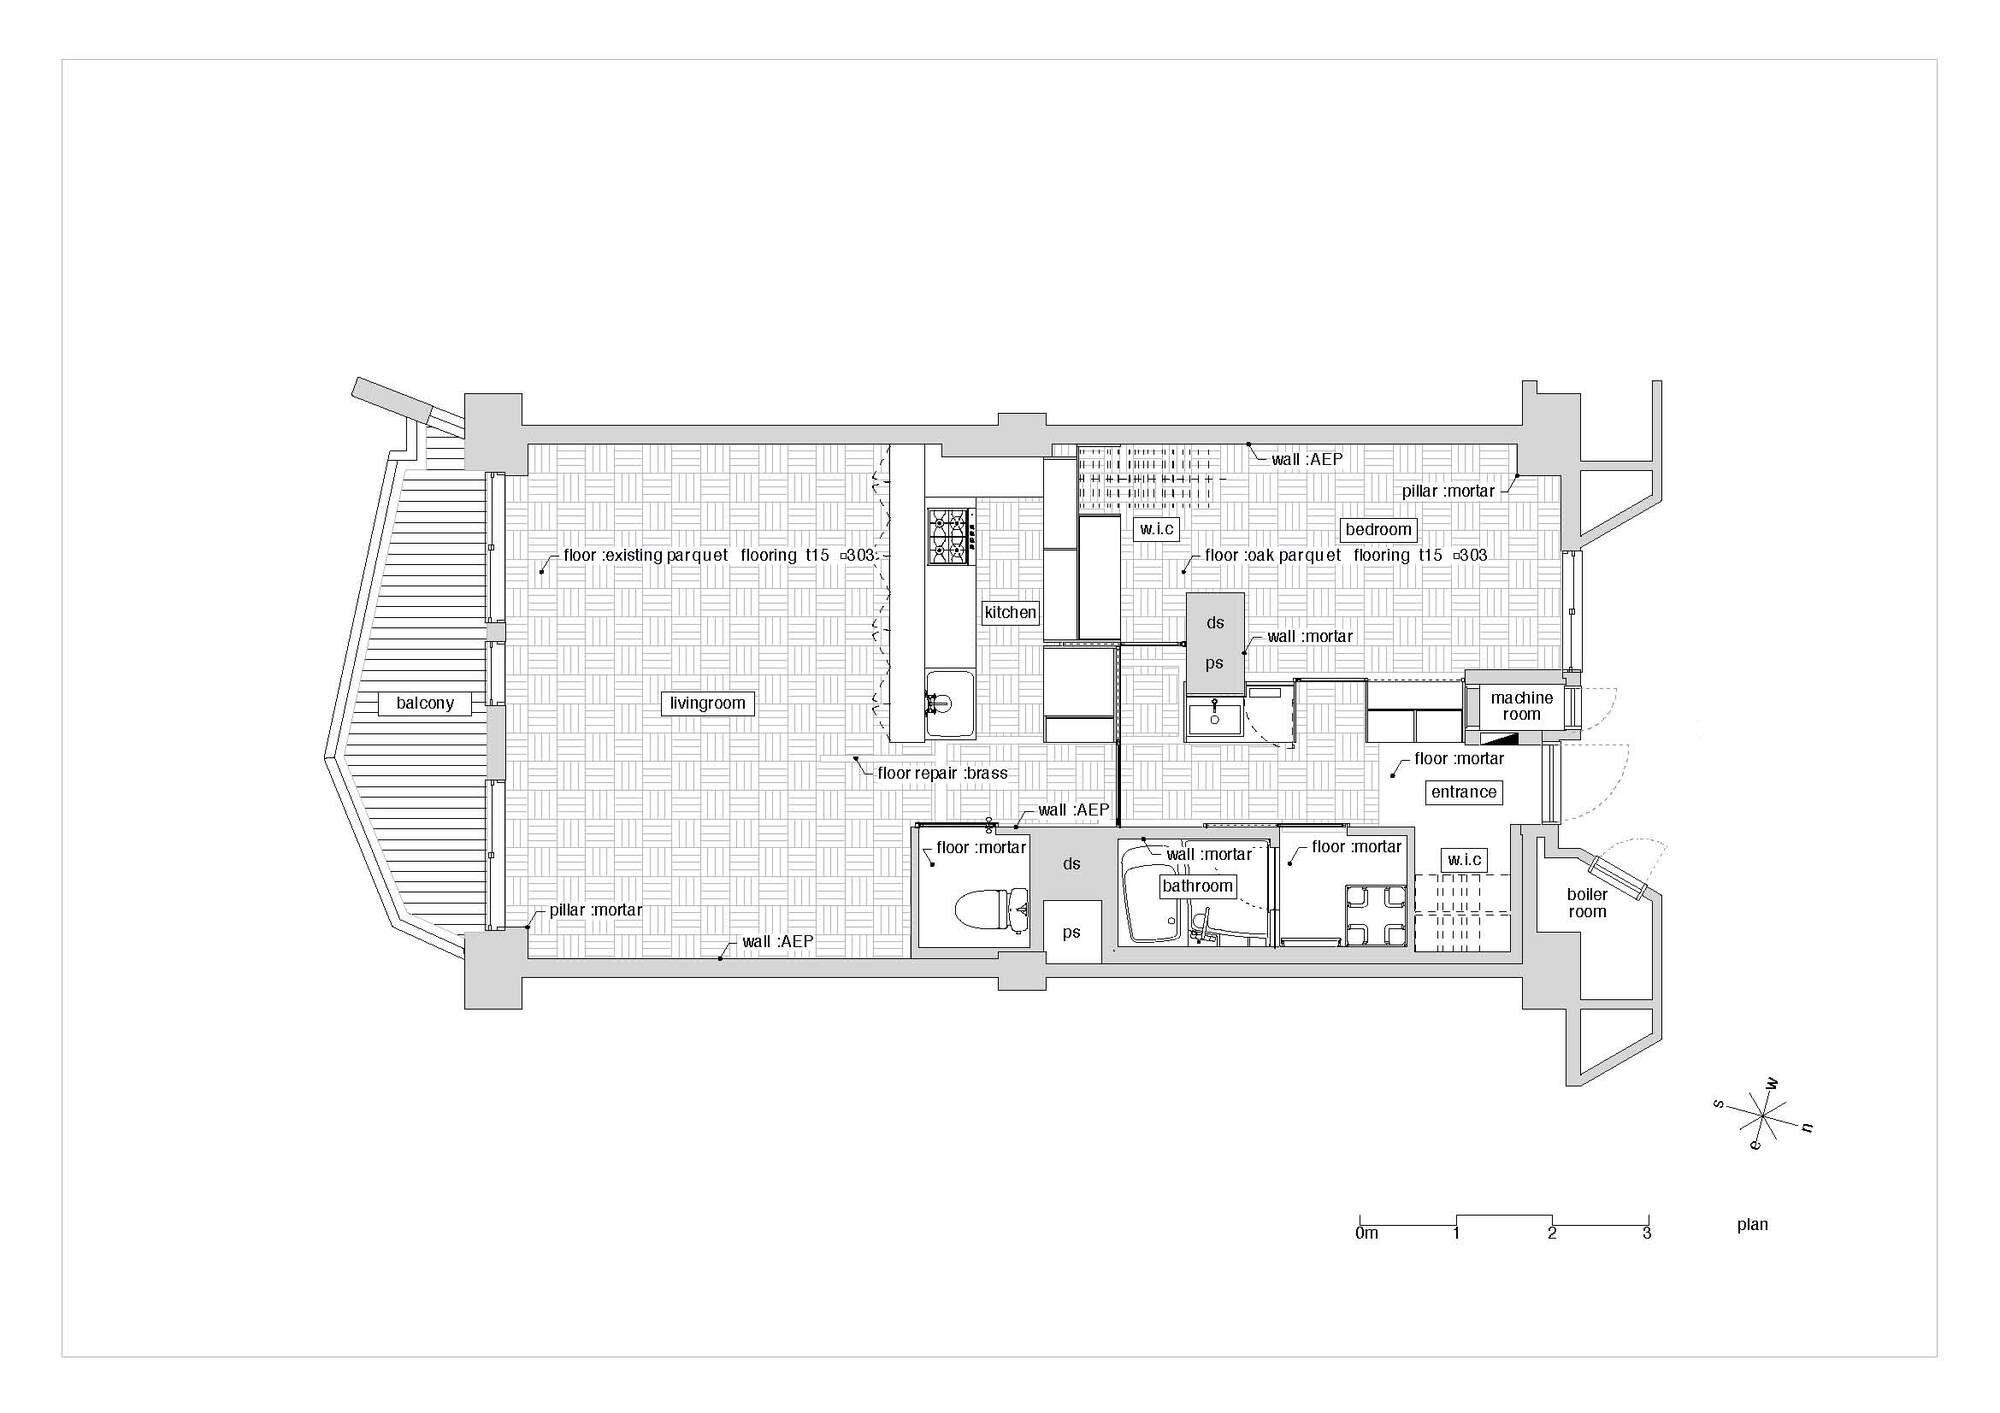 Gakugeidaigaku - Yuichi Yoshida & Associates - Japan - Floor Plan - Humble Homes